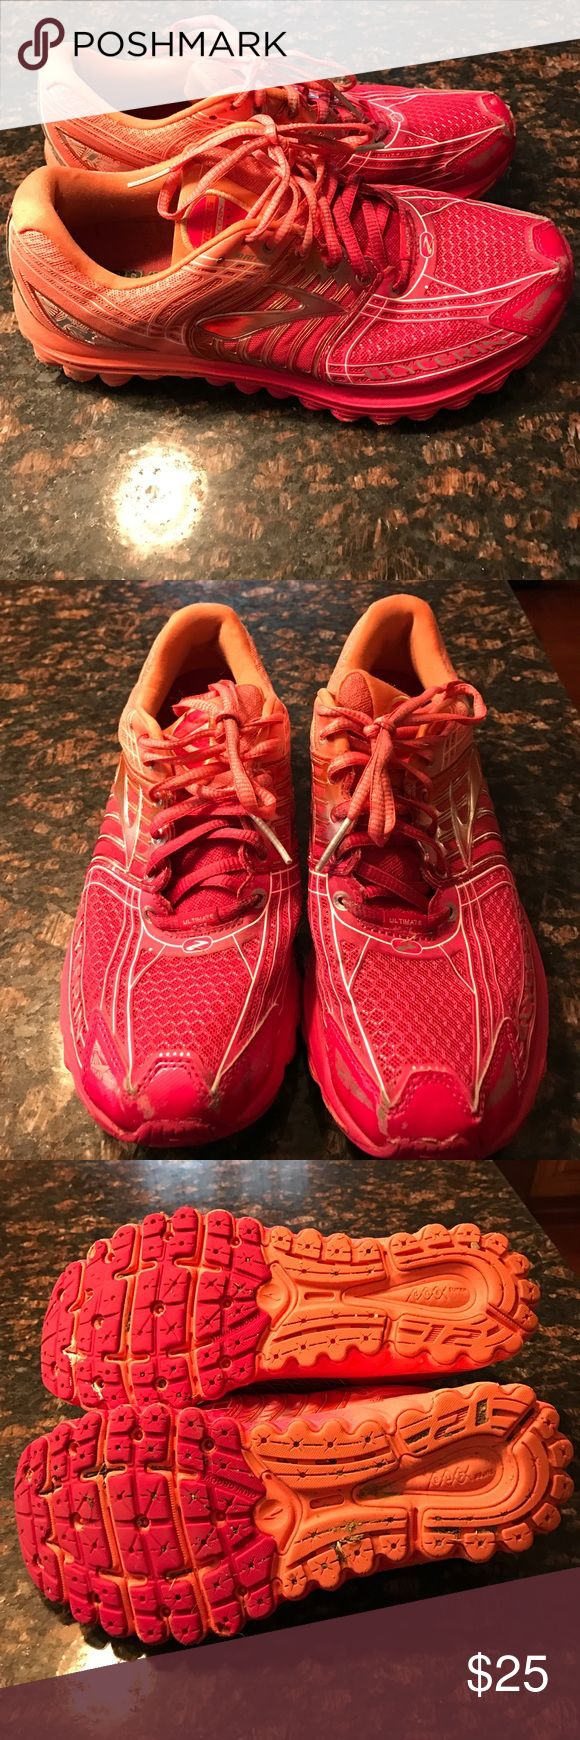 Brooks running sneakers lots of tread left Brooks running sneakers lots of life left Brooks Shoes Sneakers